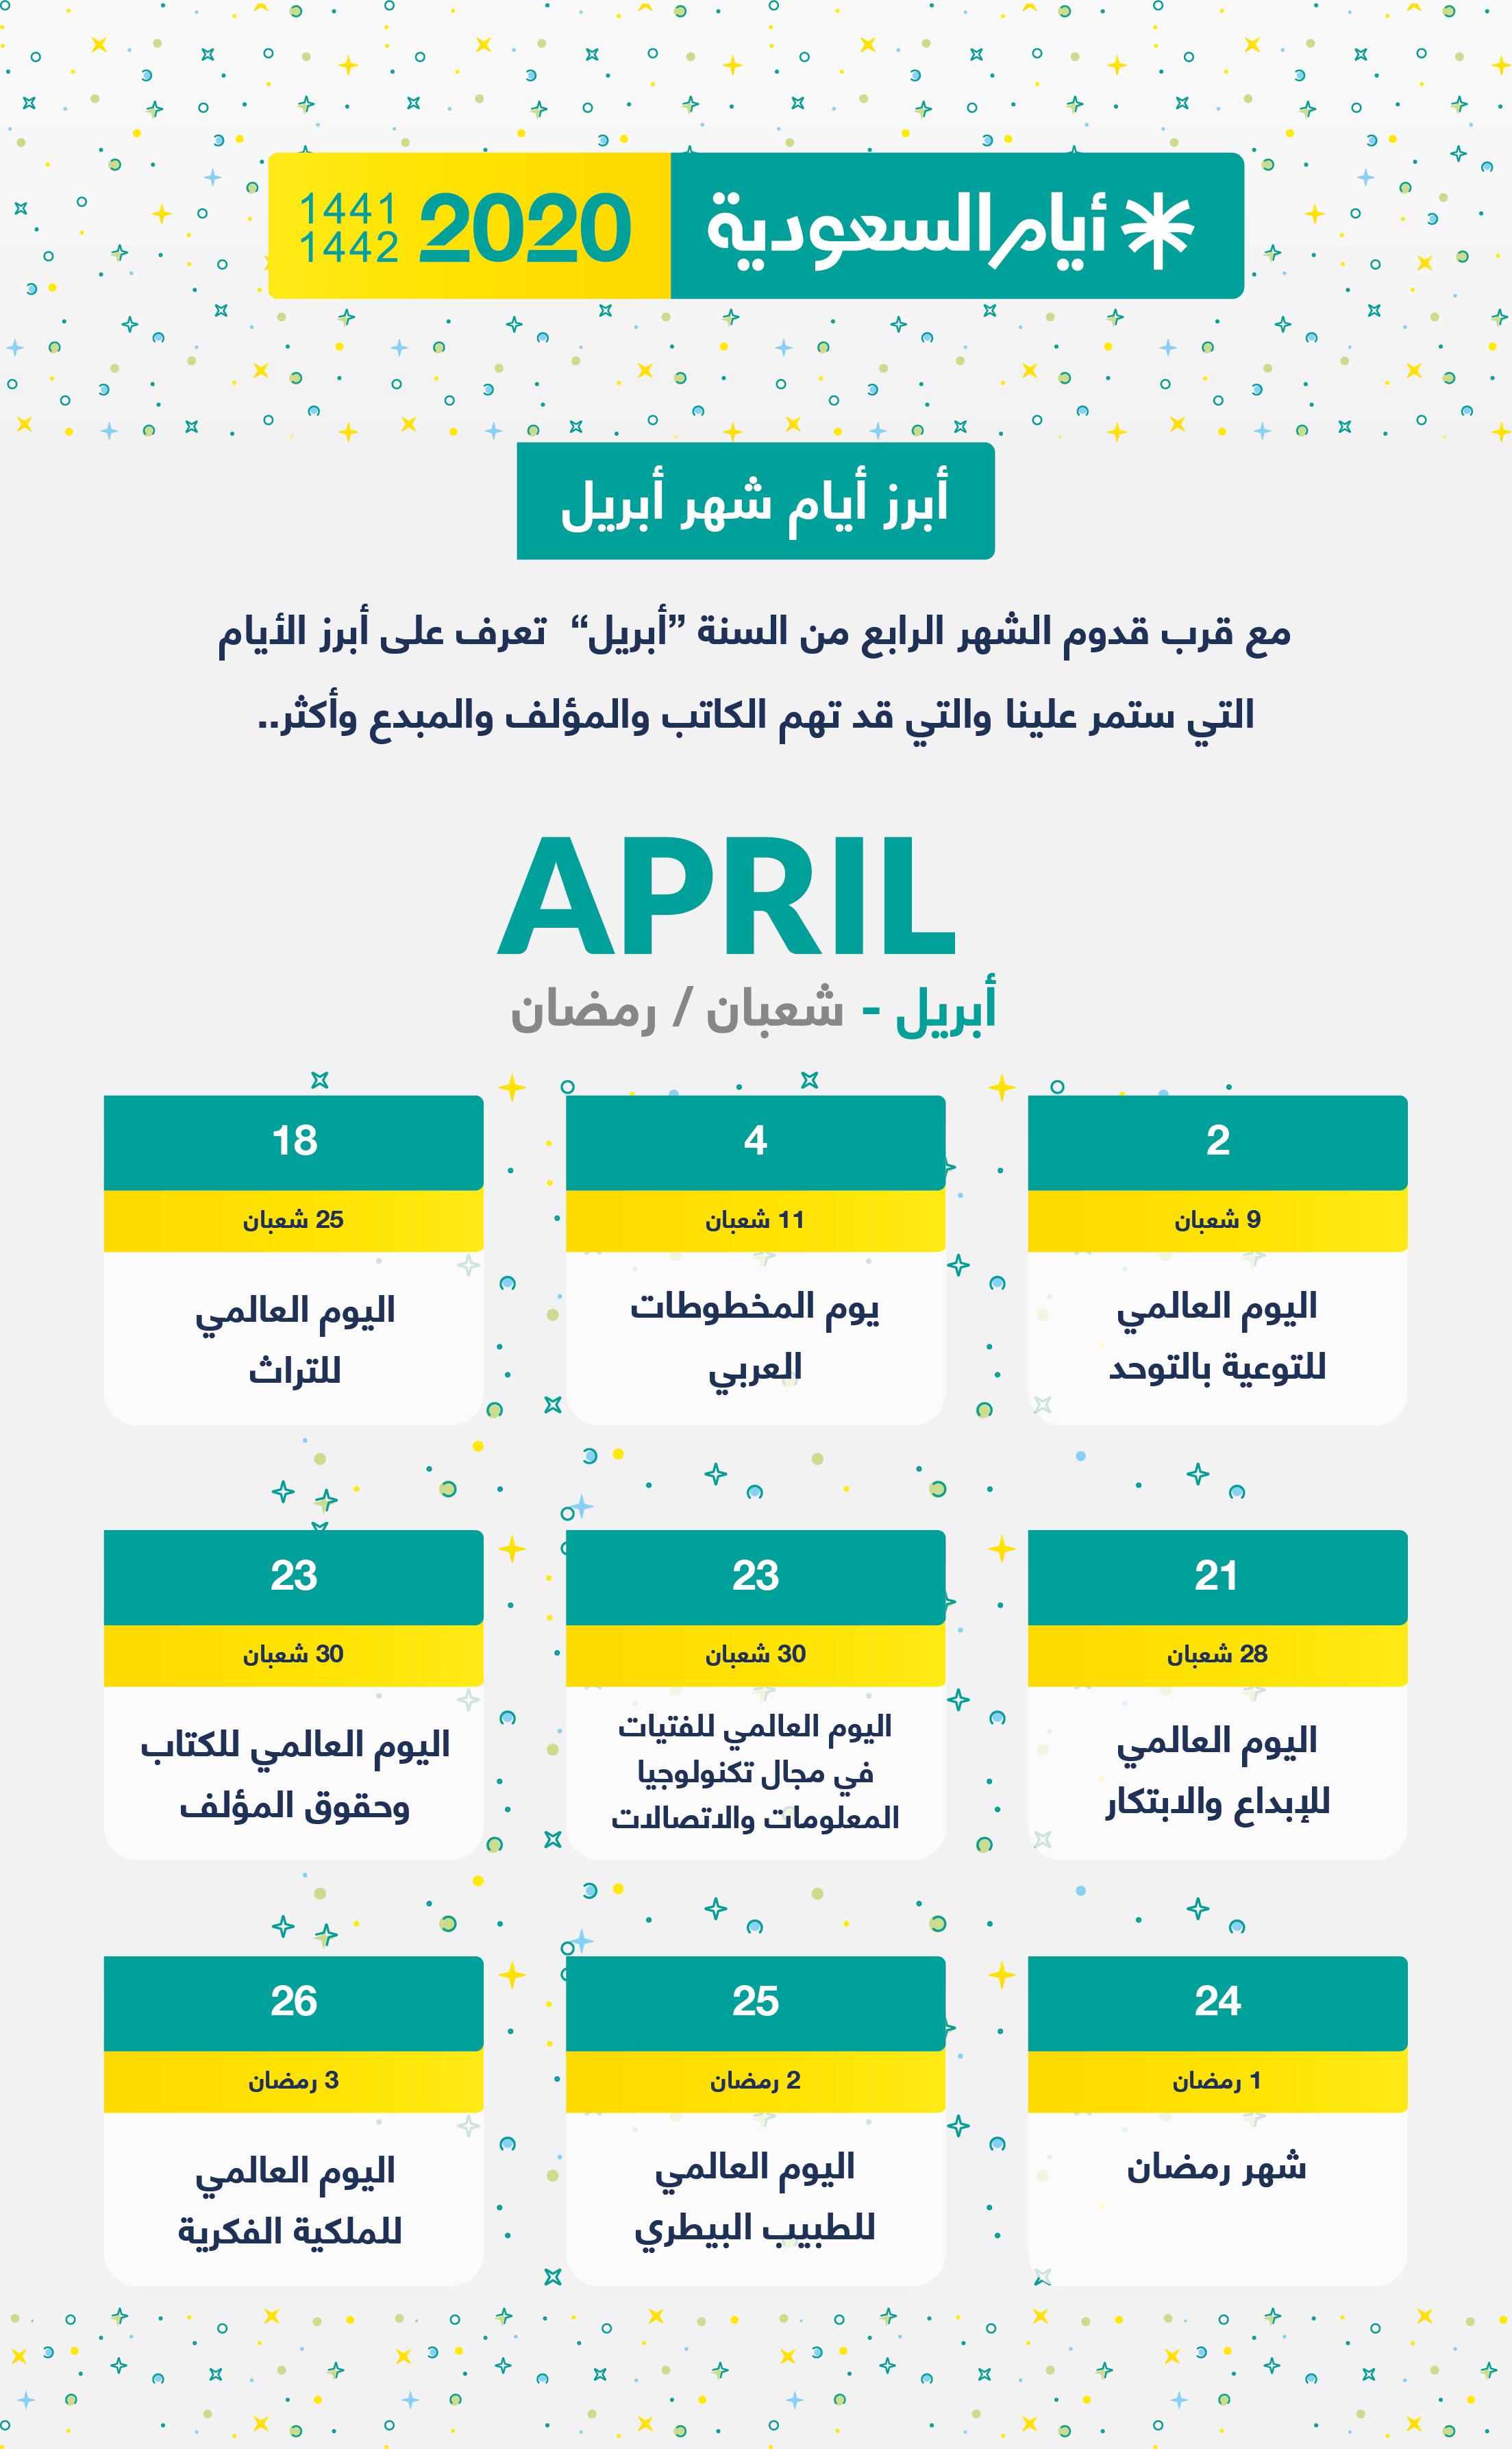 6f598244 3021 4d7c 9a25 a06809085113  المخطوطات والتراث والمزيد مع أيام السعودية لأبريل